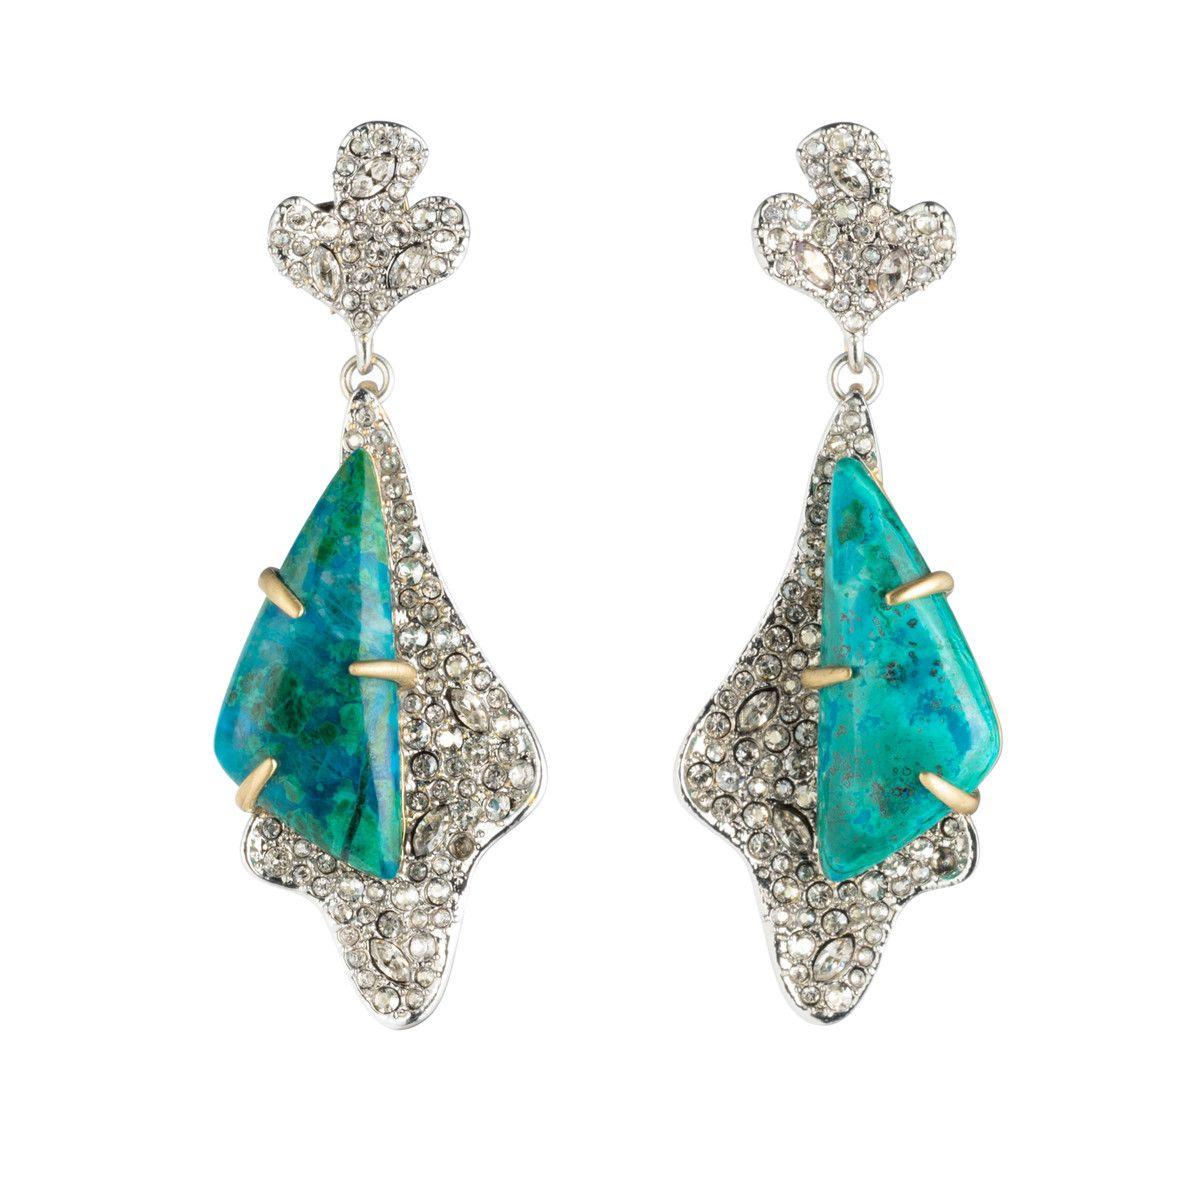 514c06c5b Roxbury_Dangling Post Earring 1 | Pre-Fall 2018 in 2019 | Jewelry ...